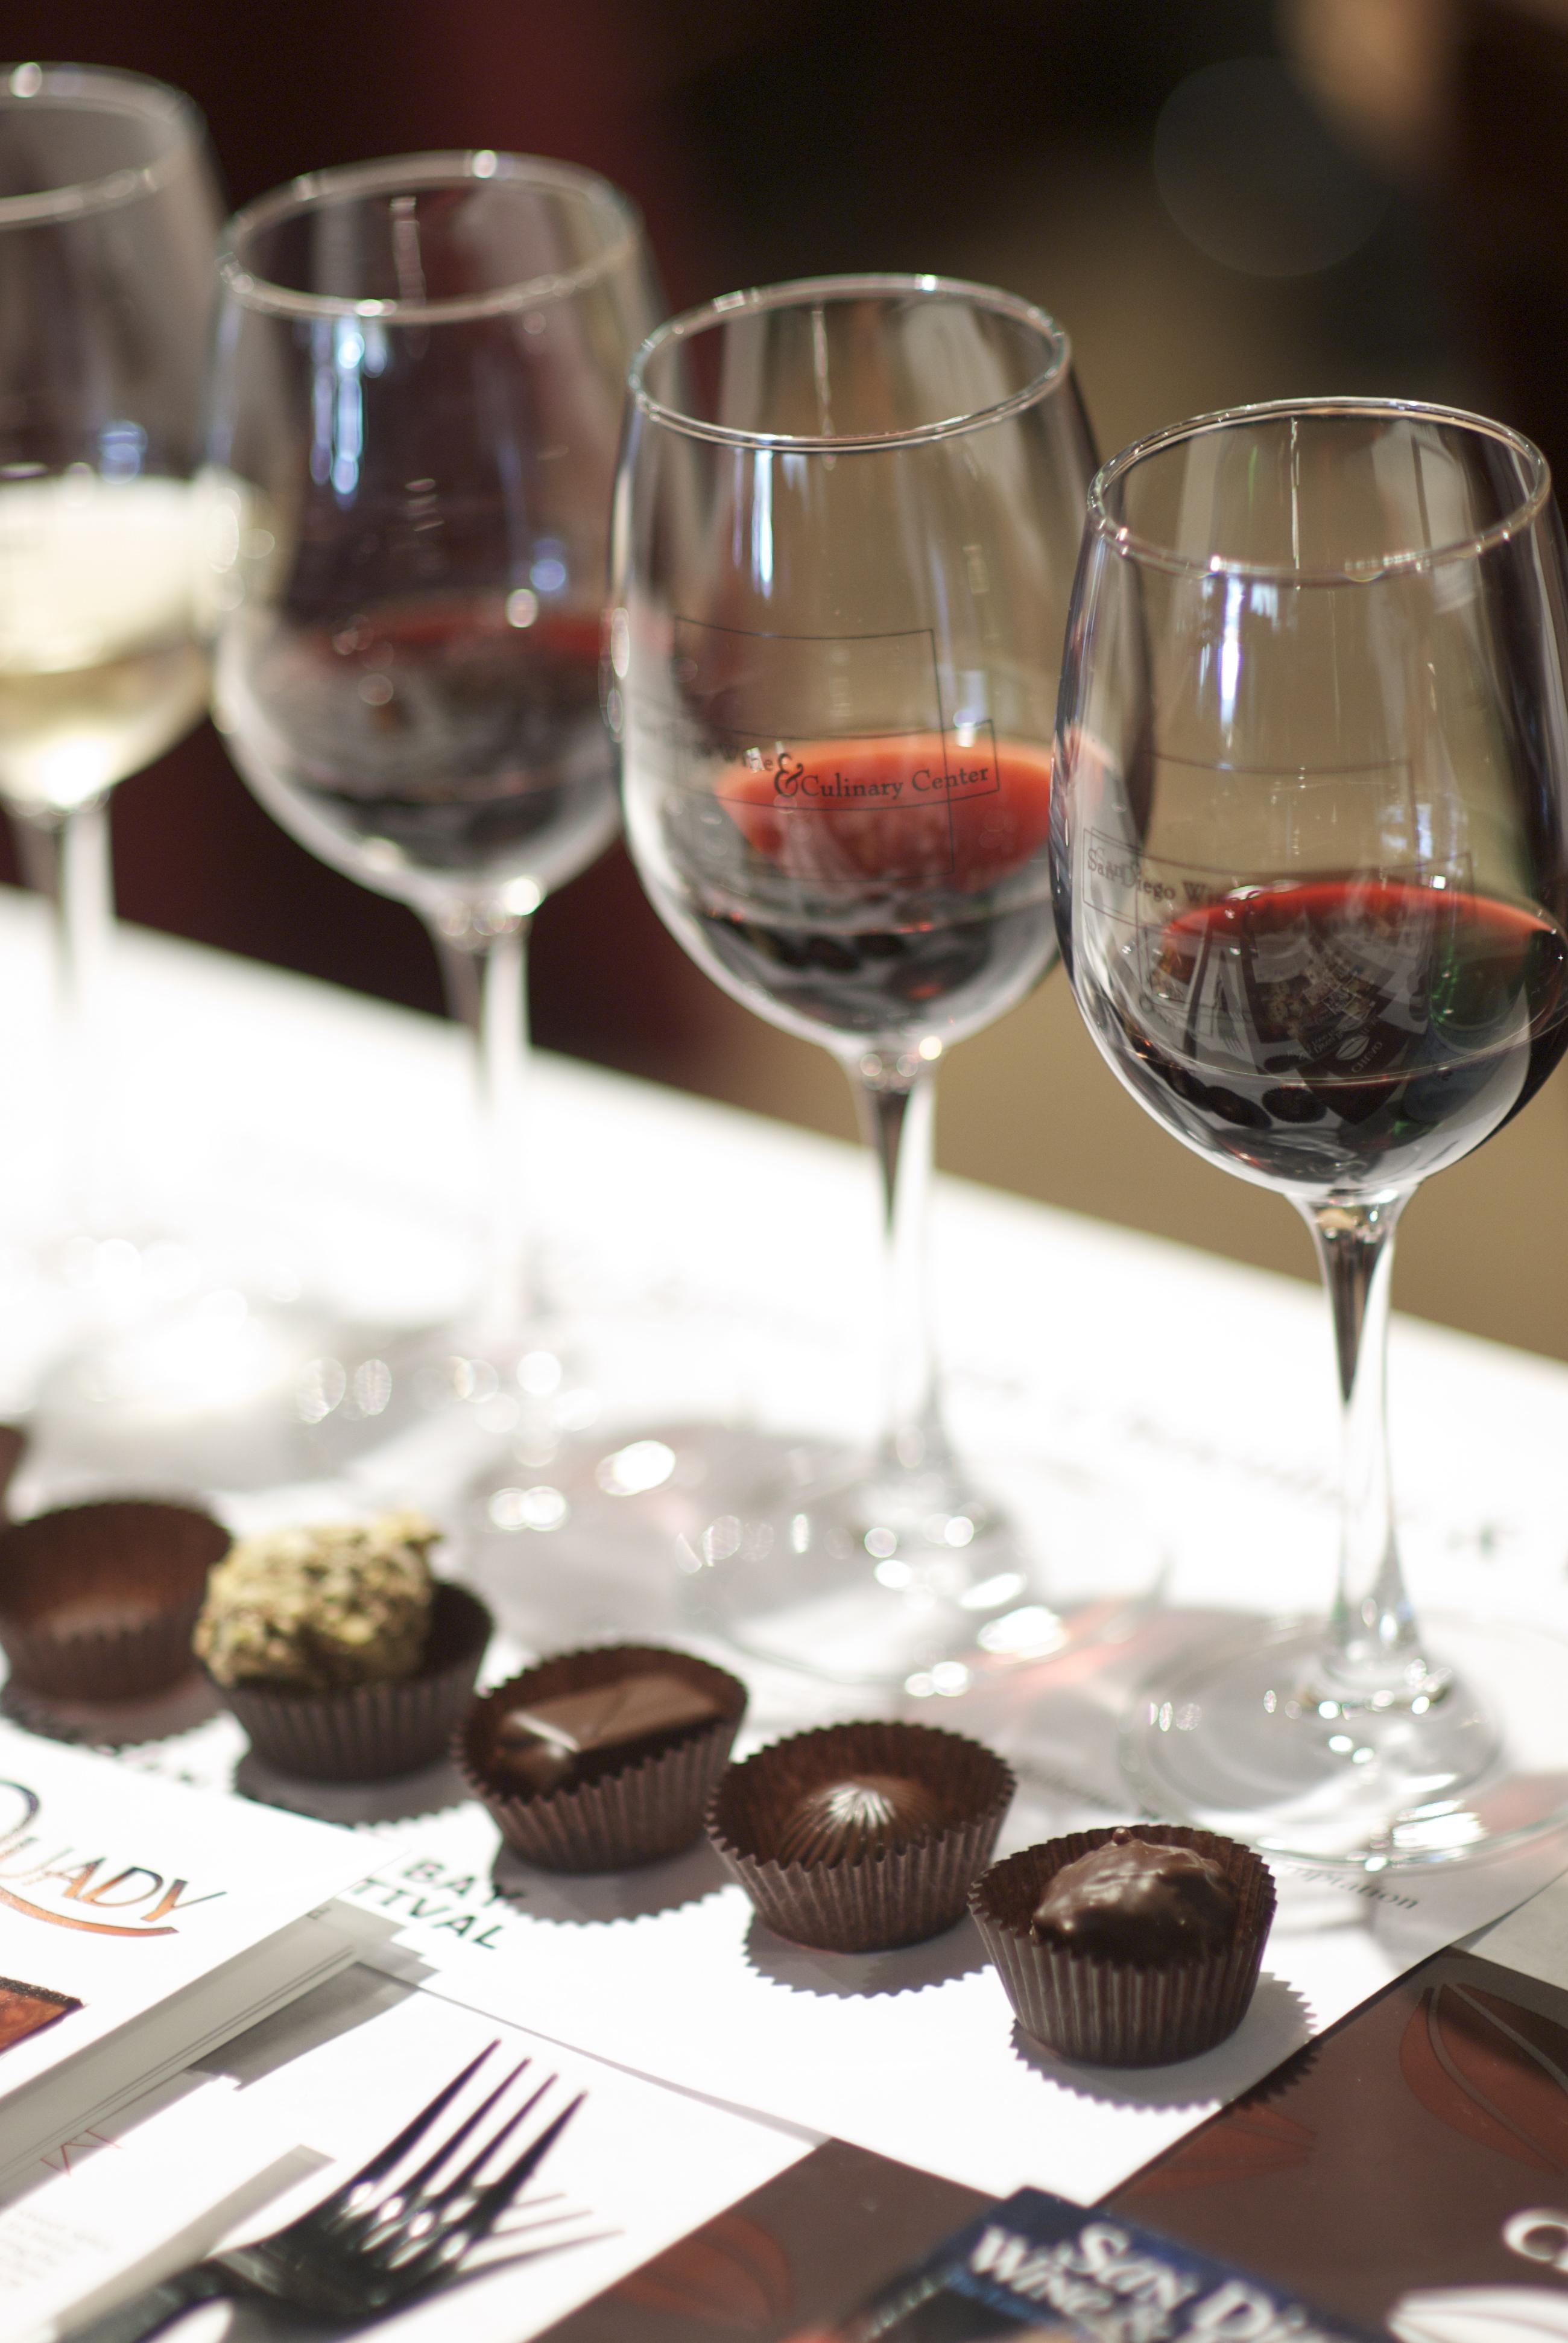 File:Red wine and chocolate pairing.jpg - Wikimedia Commons